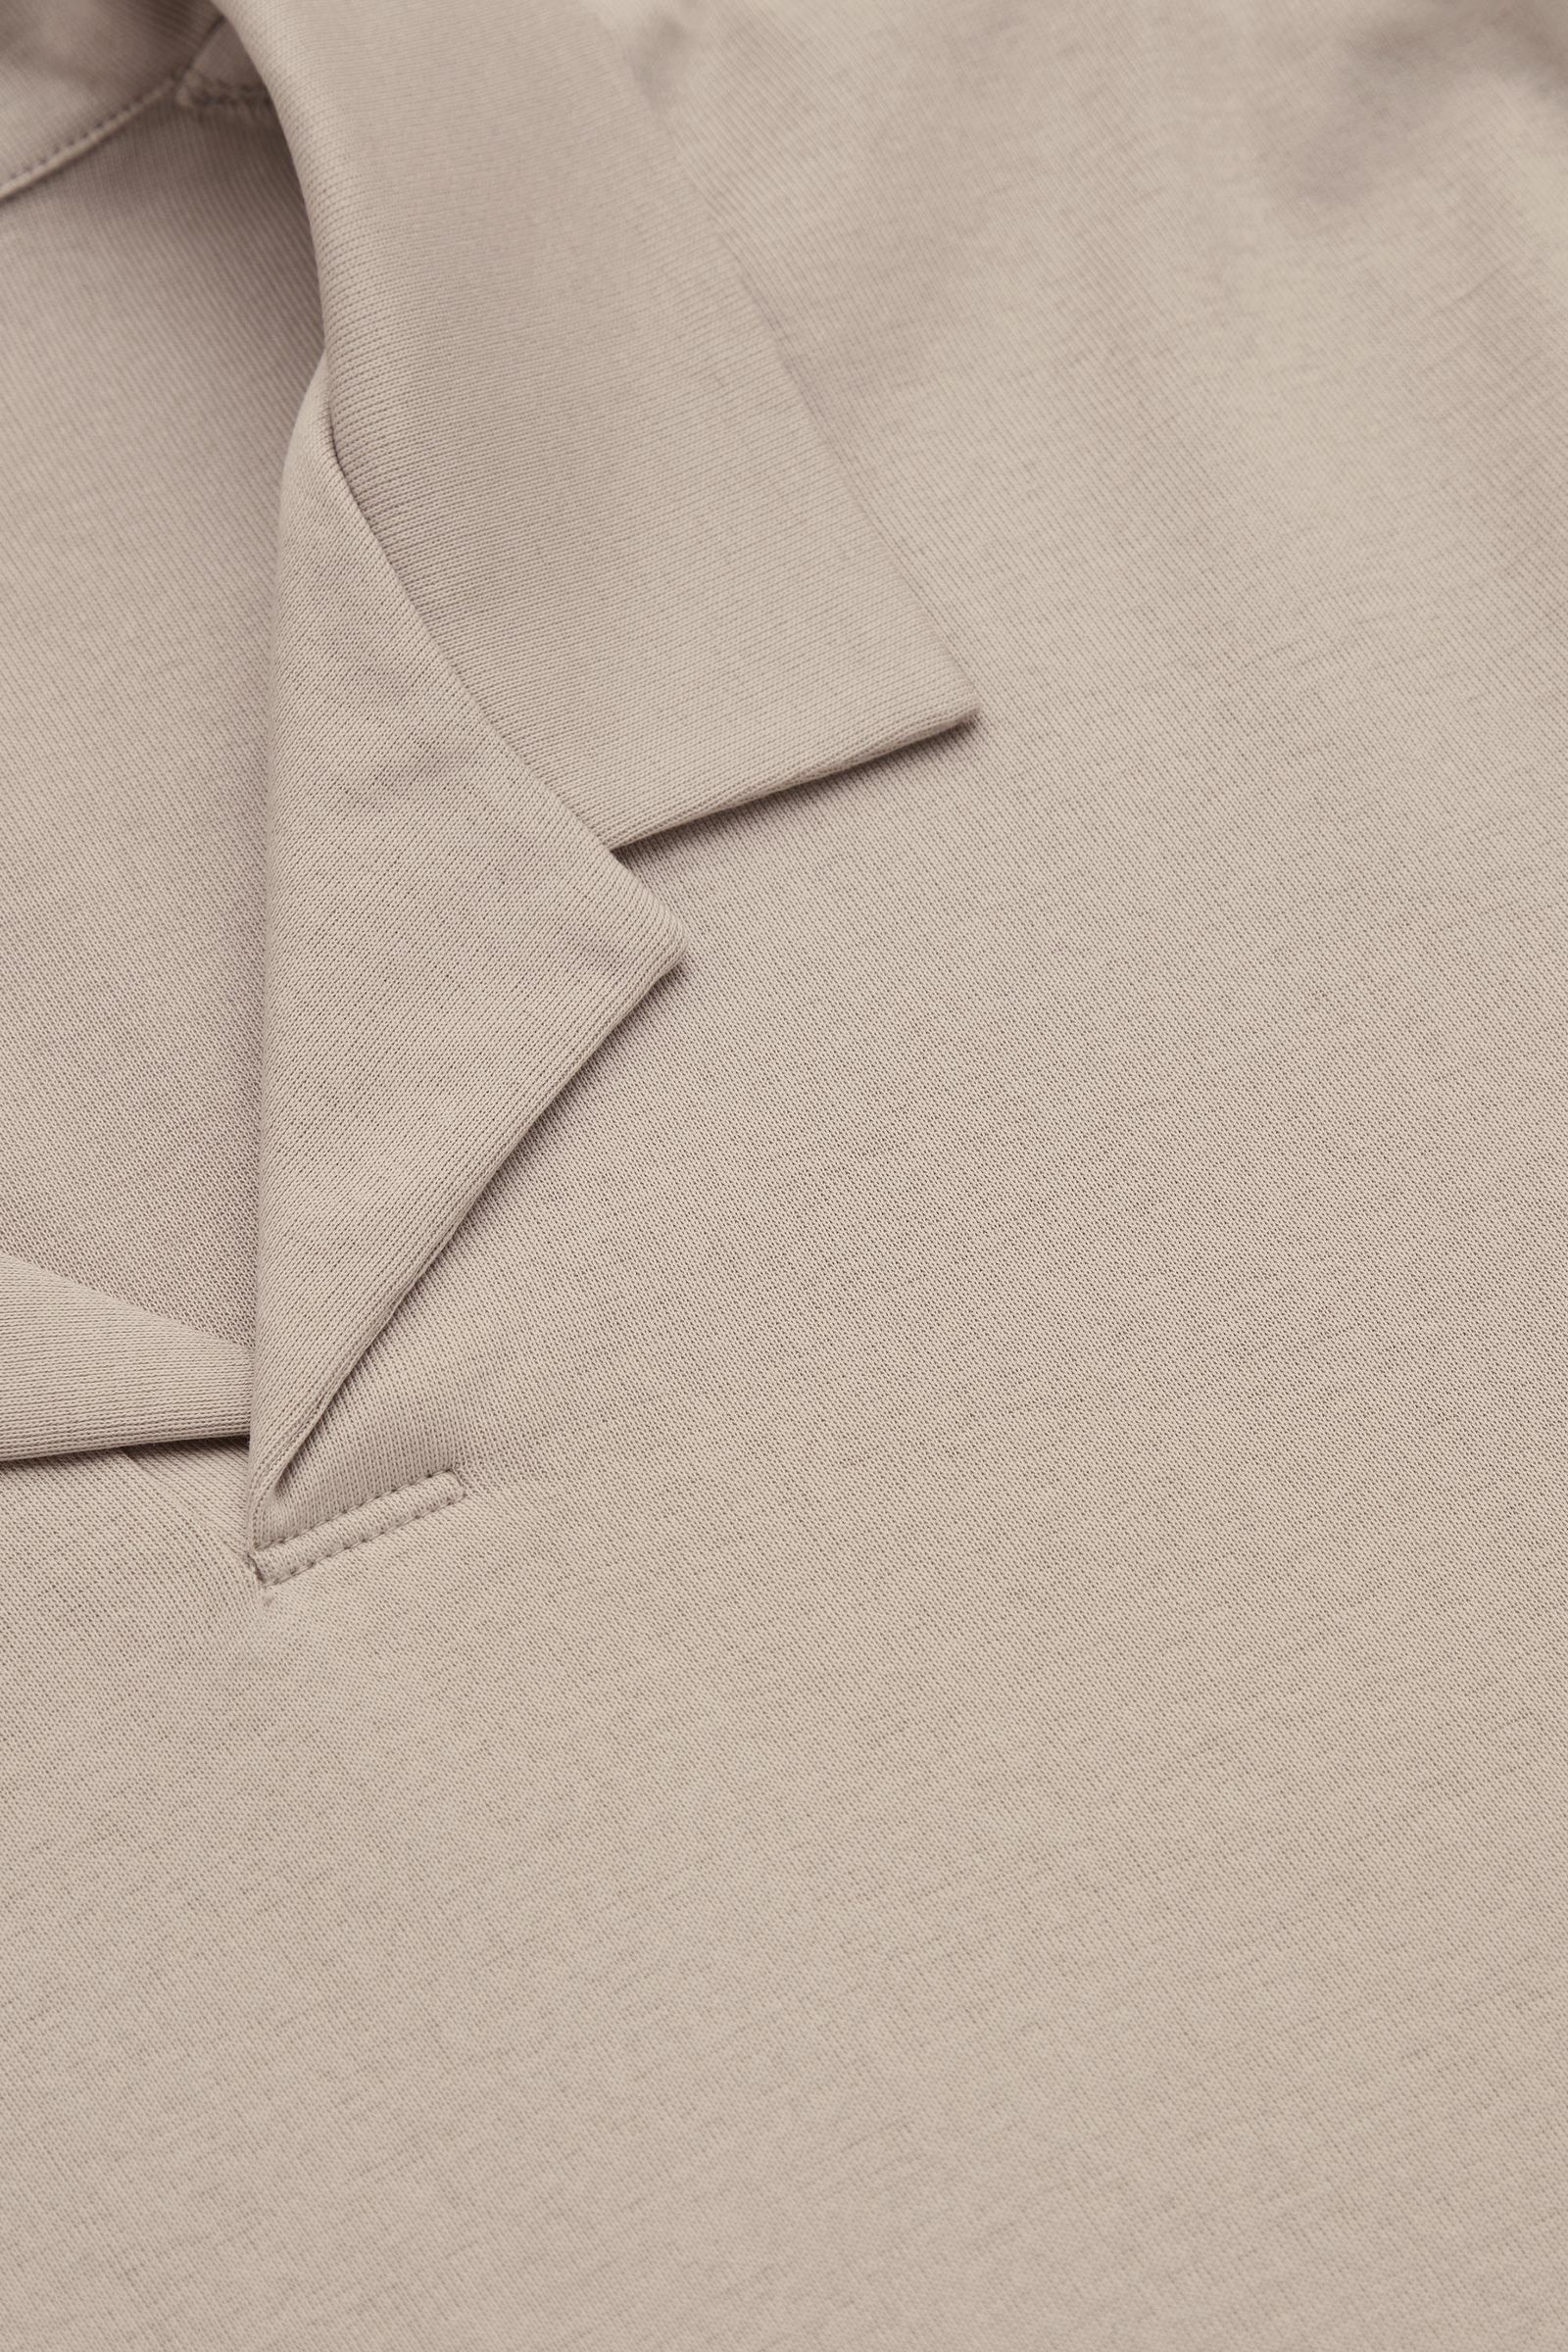 COS 오픈 칼라 폴로 셔츠의 몰컬러 Detail입니다.